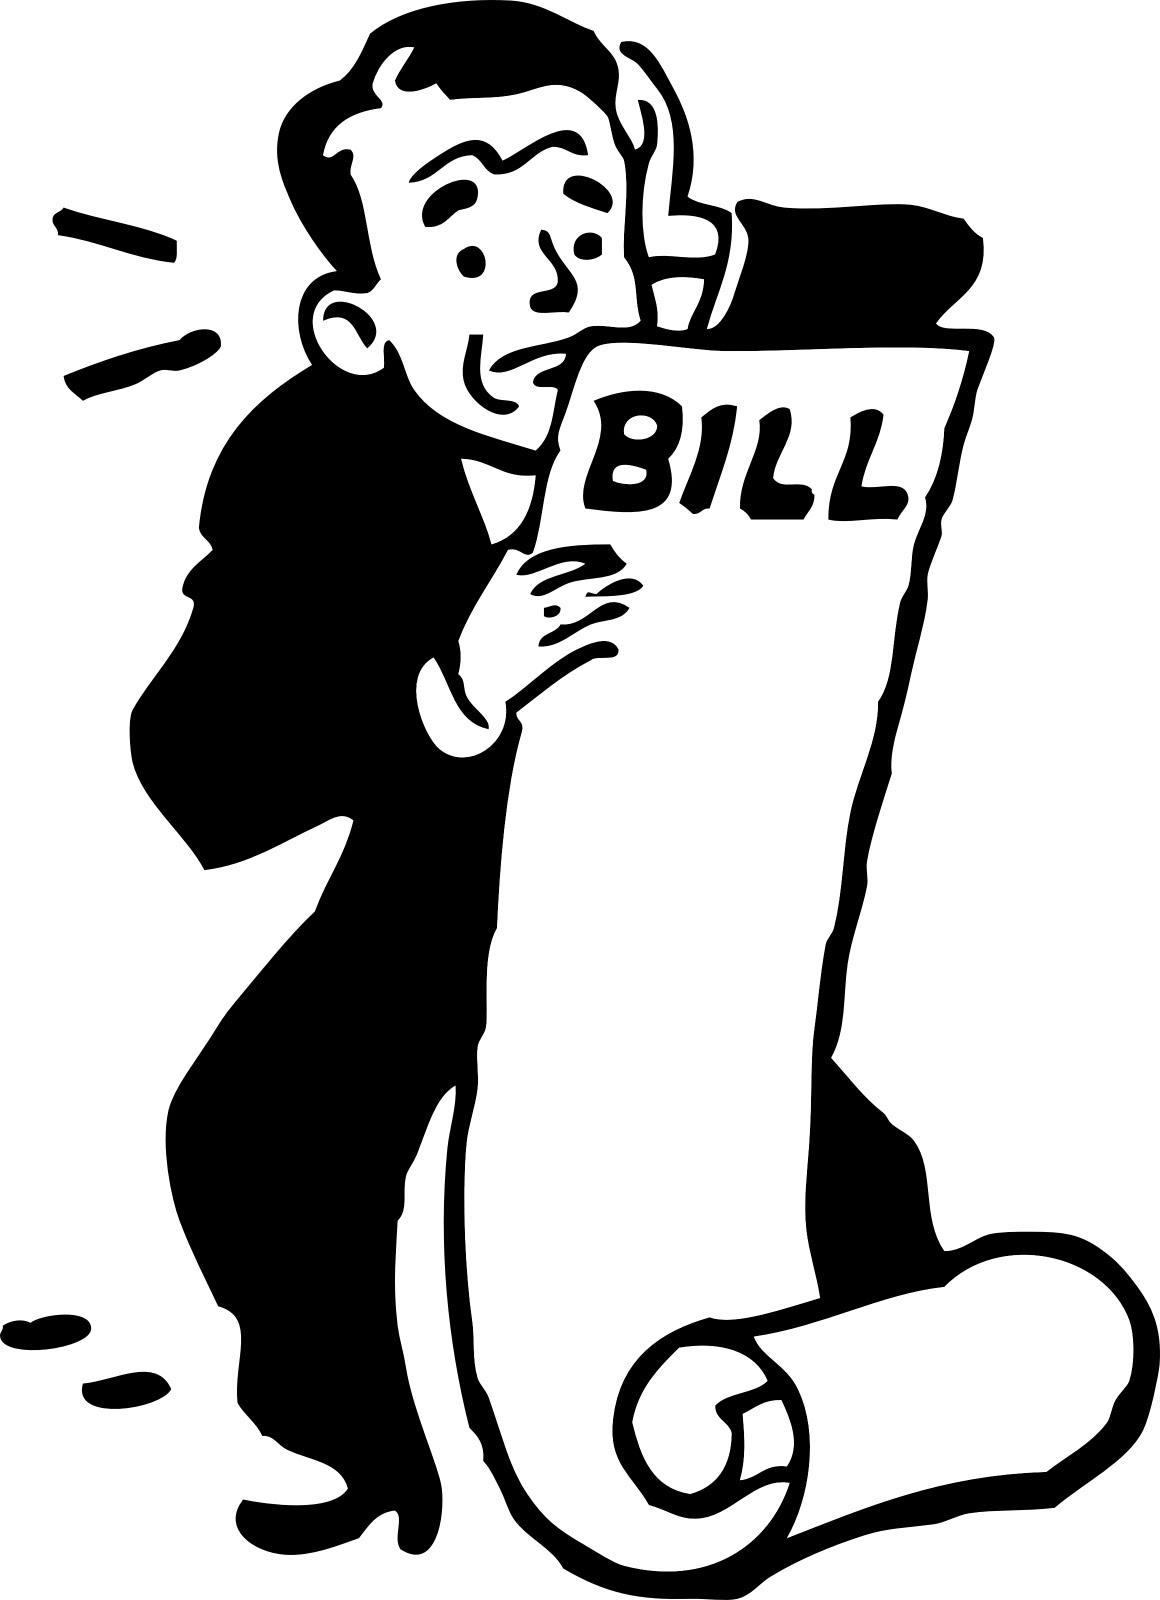 electricity bill.jpg